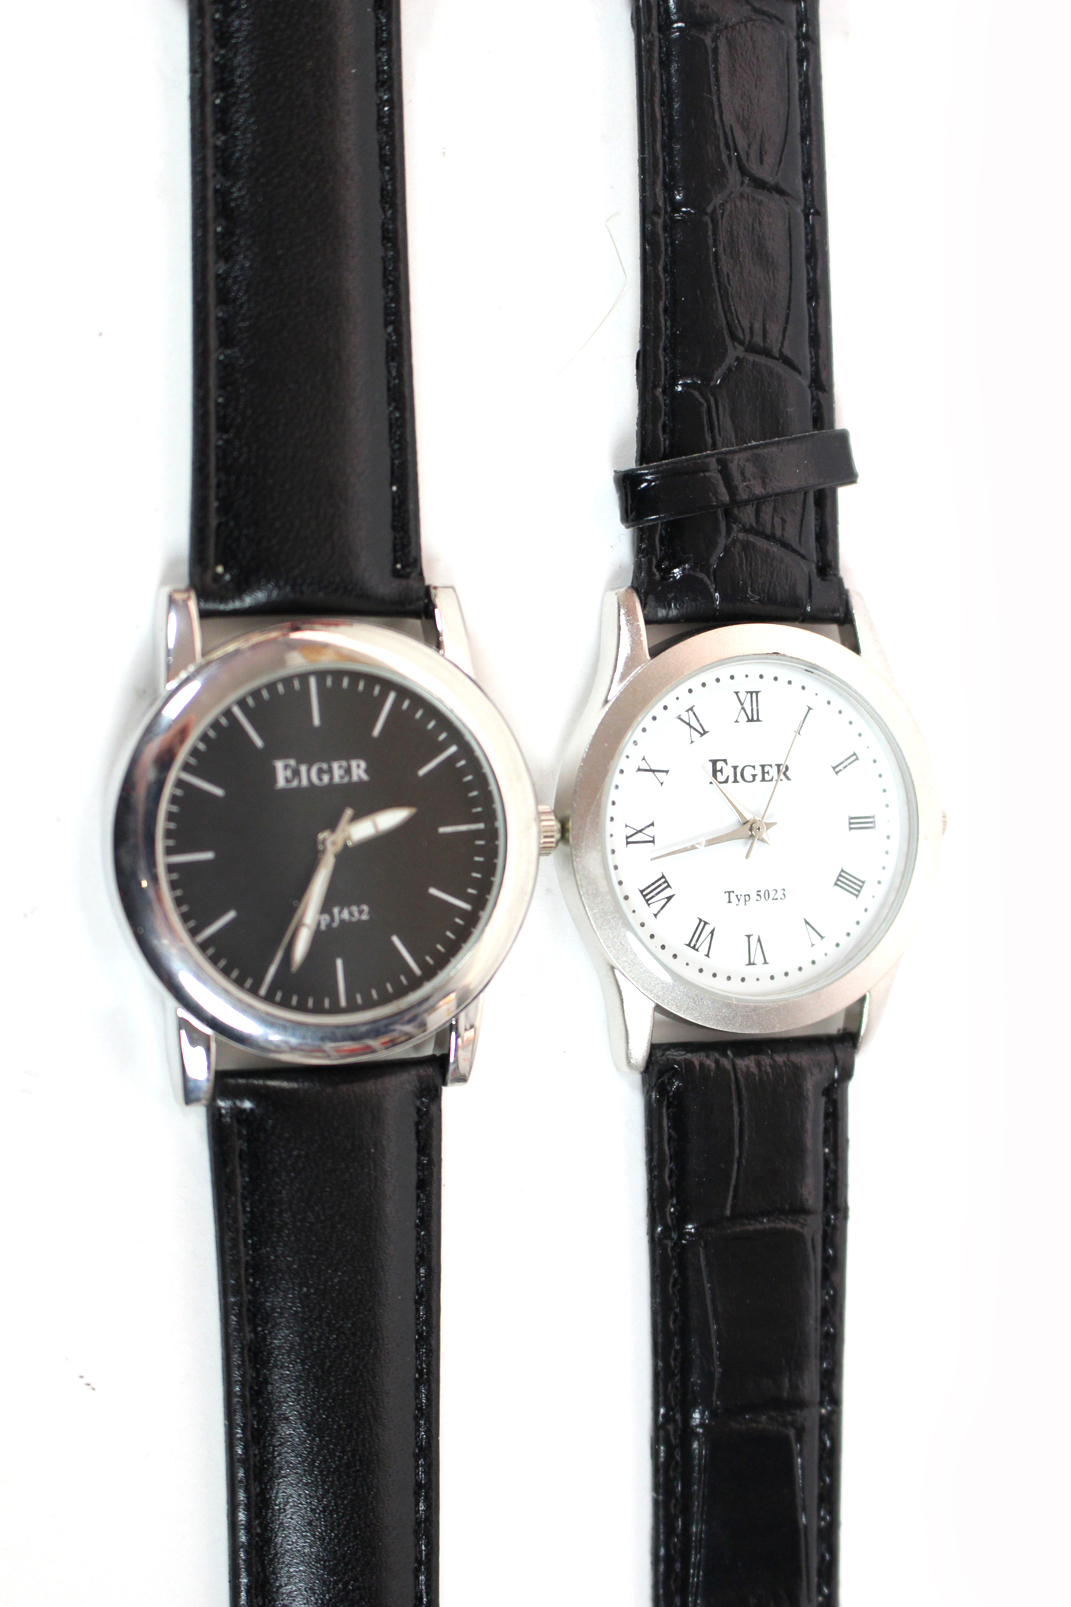 11 herren armbanduhren eiger pca armband uhren quarz. Black Bedroom Furniture Sets. Home Design Ideas